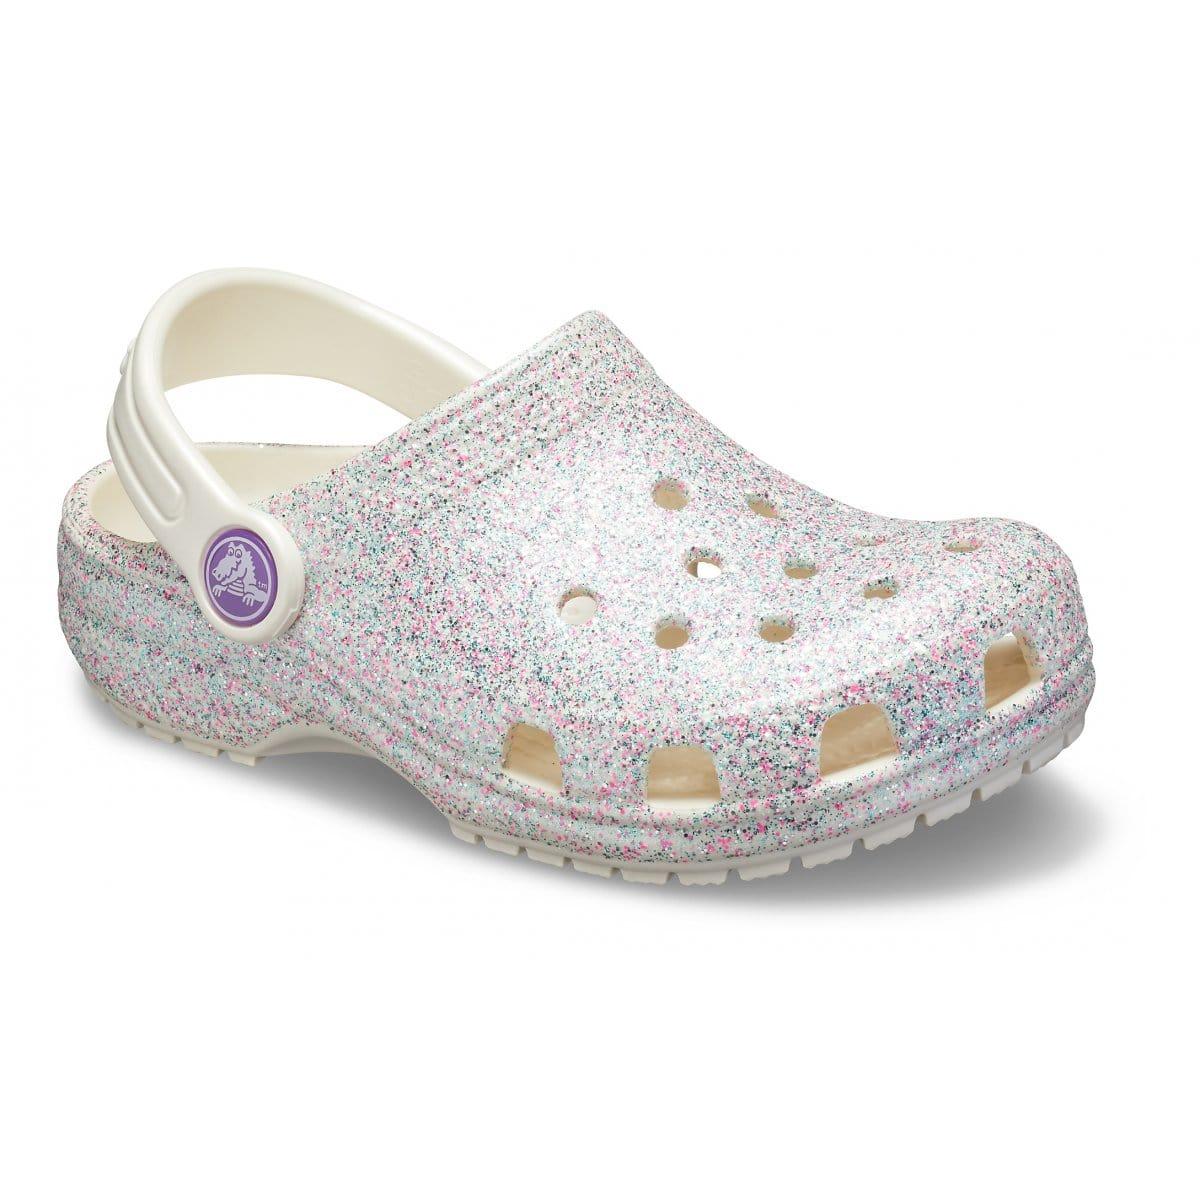 Crocs Classic Glitter Clog...